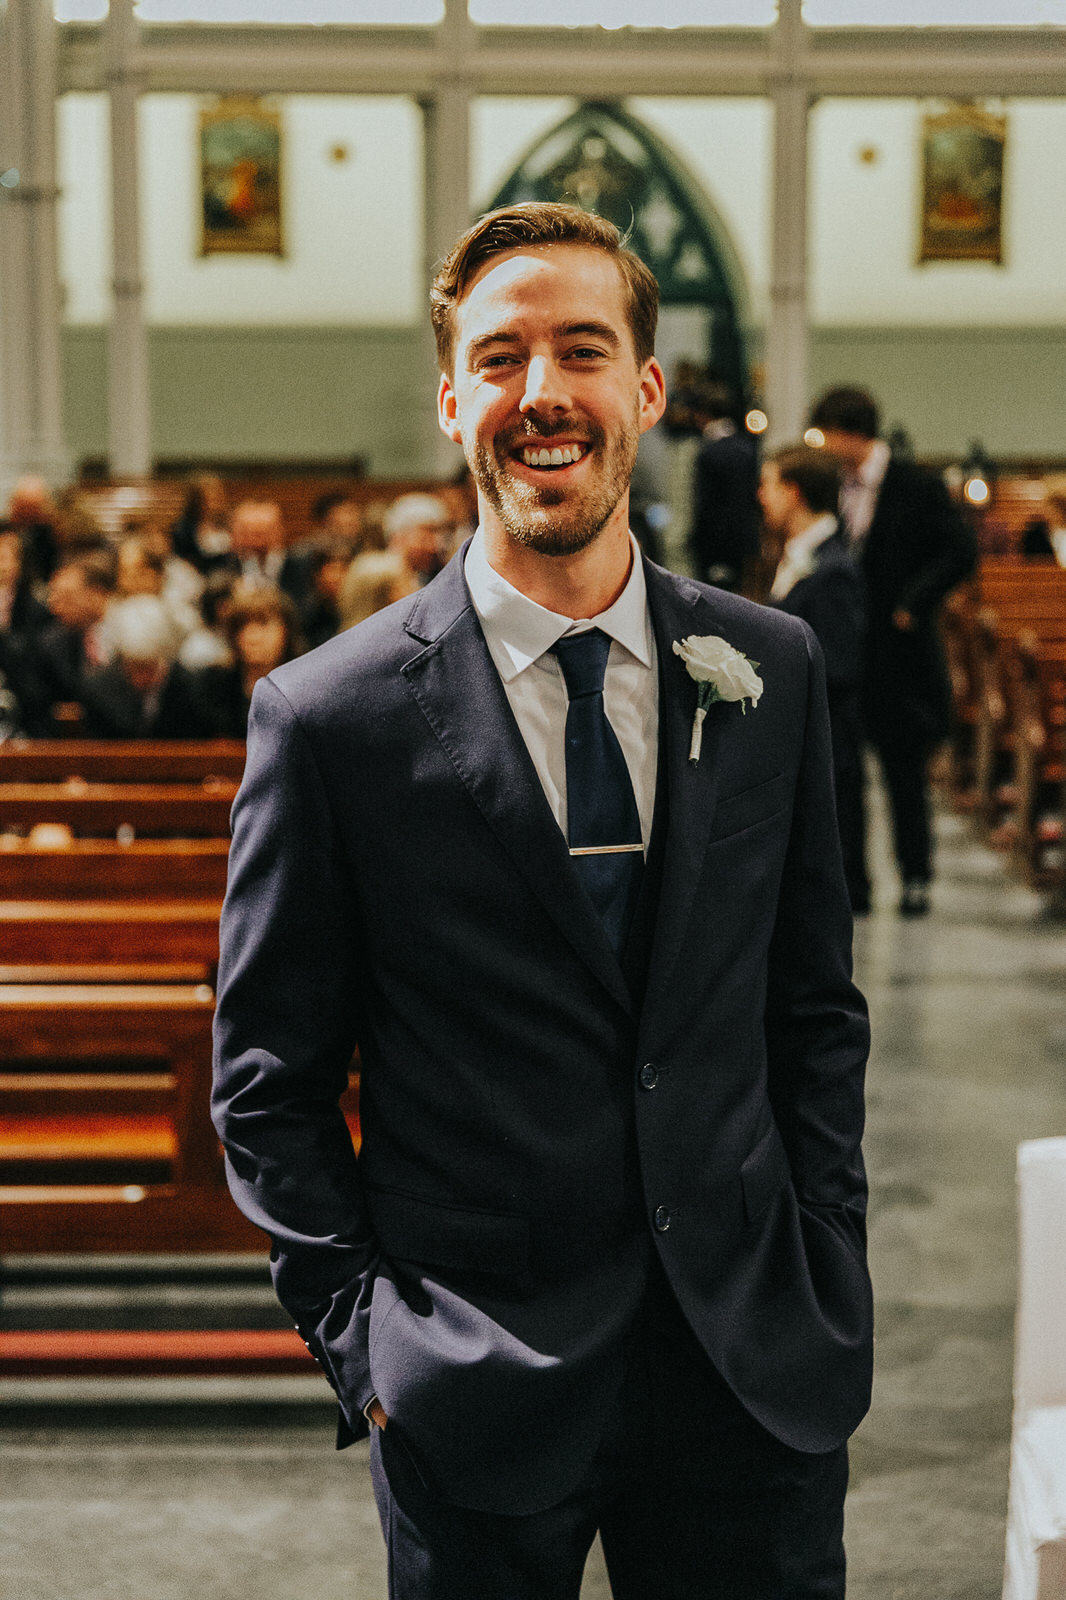 Roger_Kenny_wedding_photographer_422.jpg